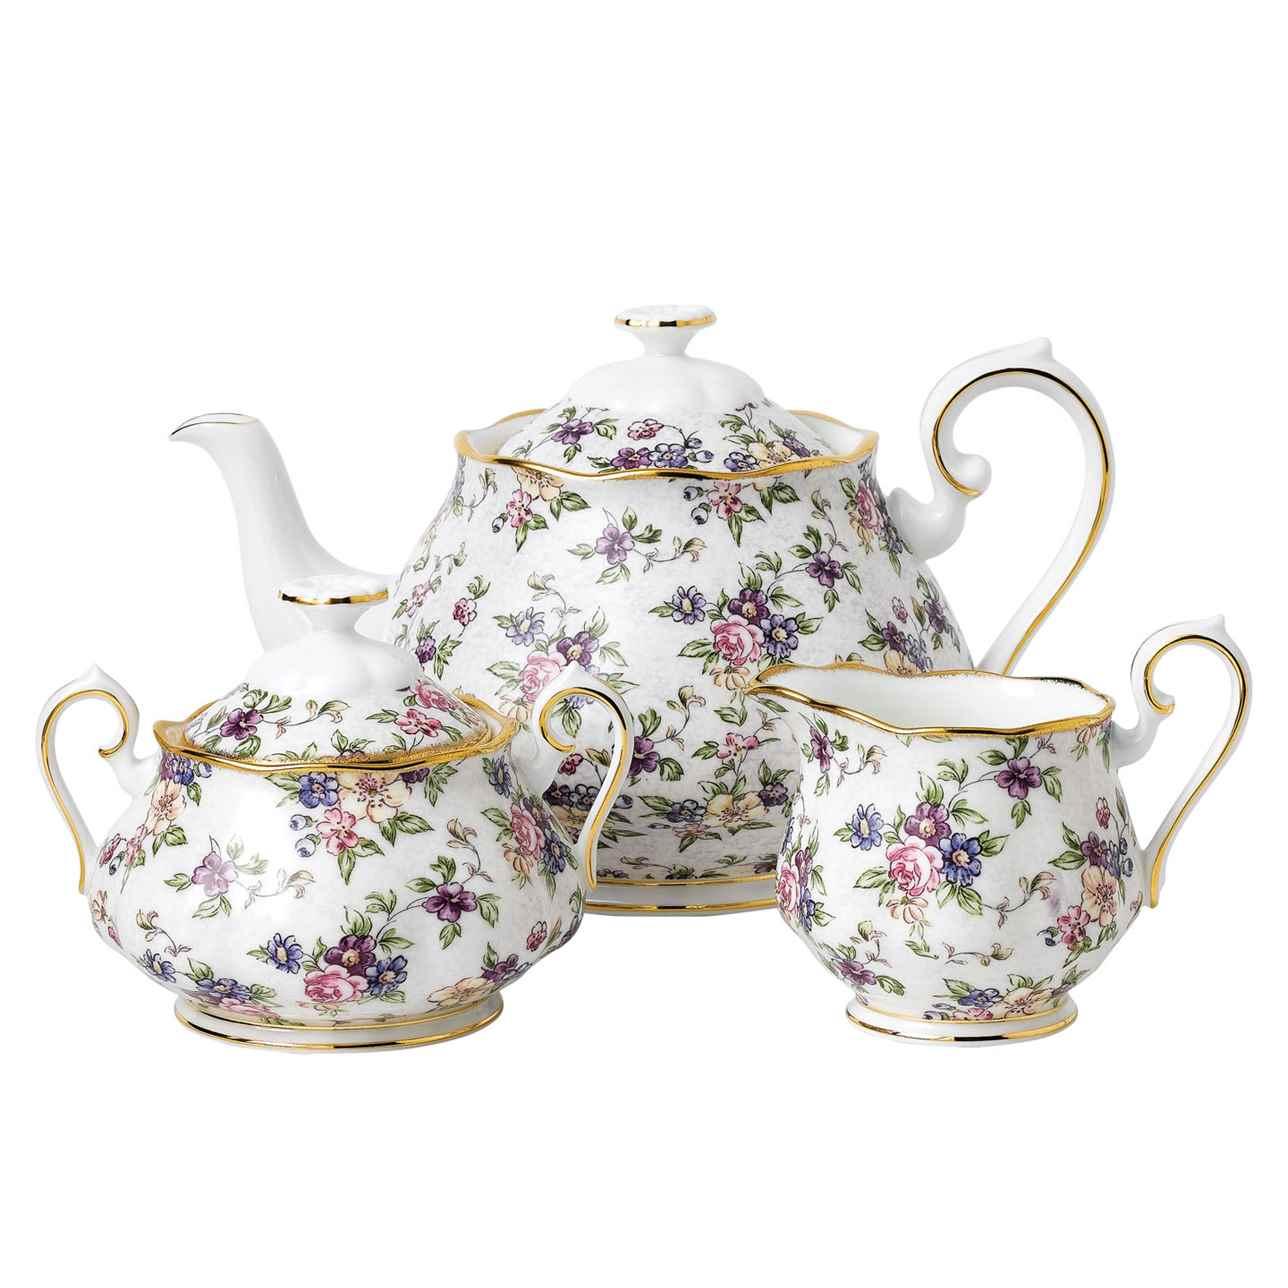 Royal Albert 100 Years of Royal Albert 1940 English Chintz Teapot, Sugar and Cream Set